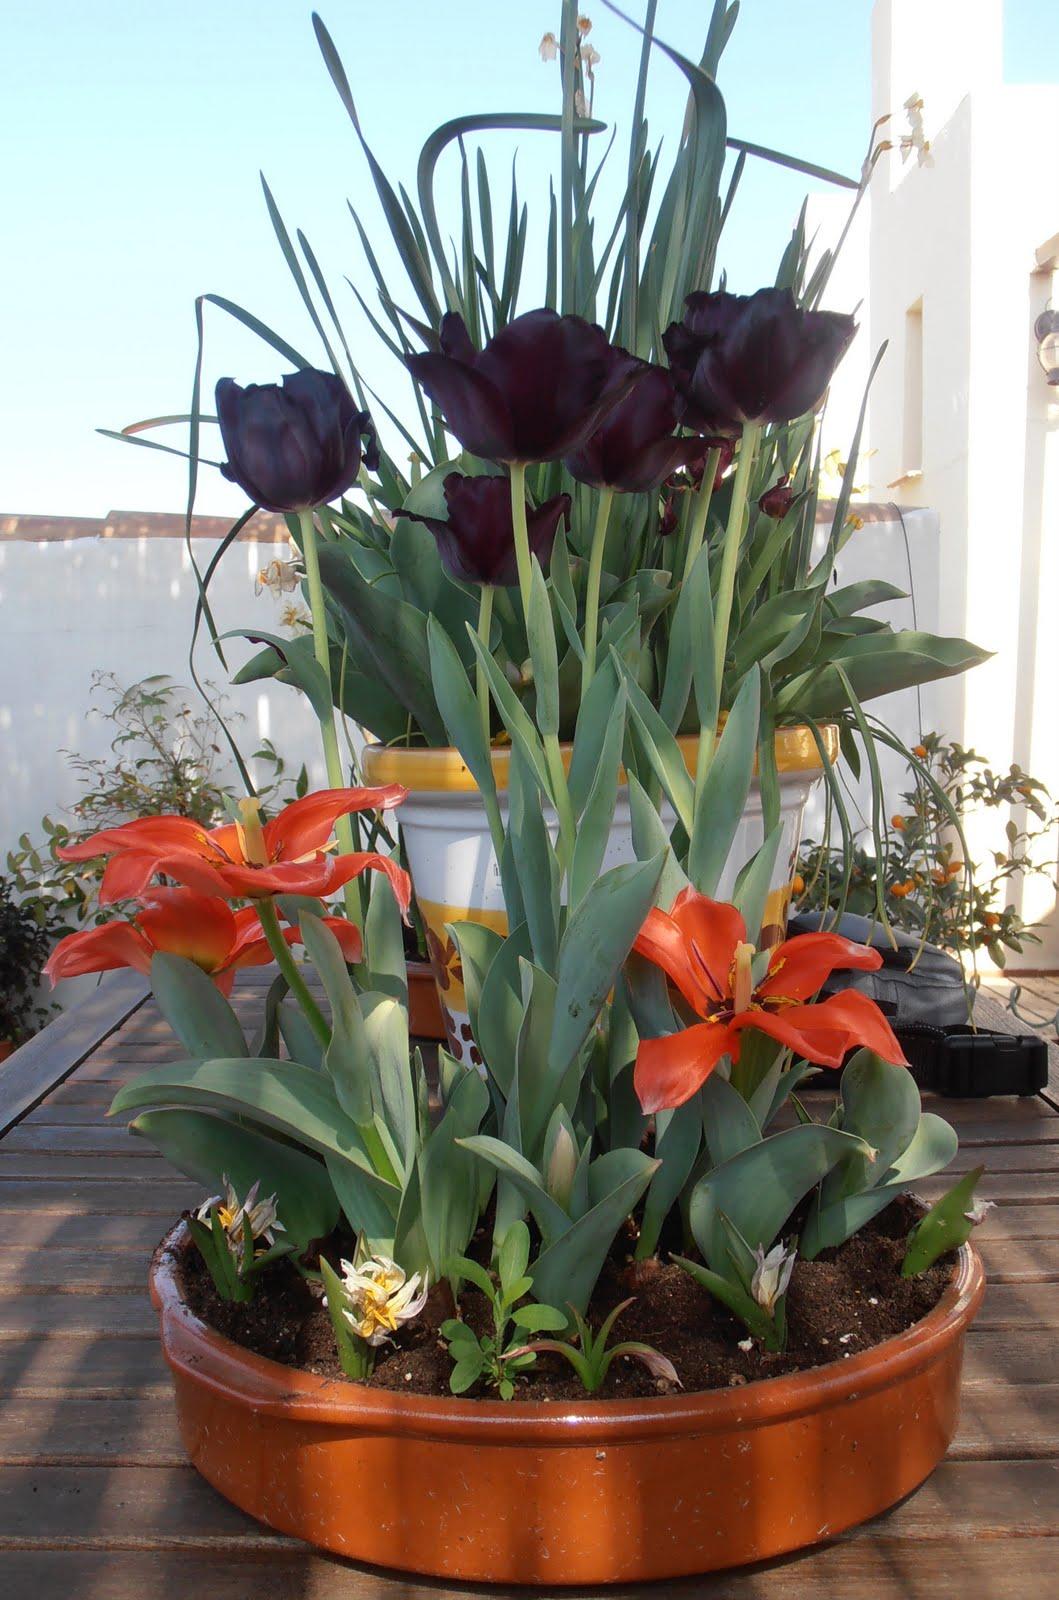 En macetas sembrando bulbos de primavera - Bulbos de otono ...